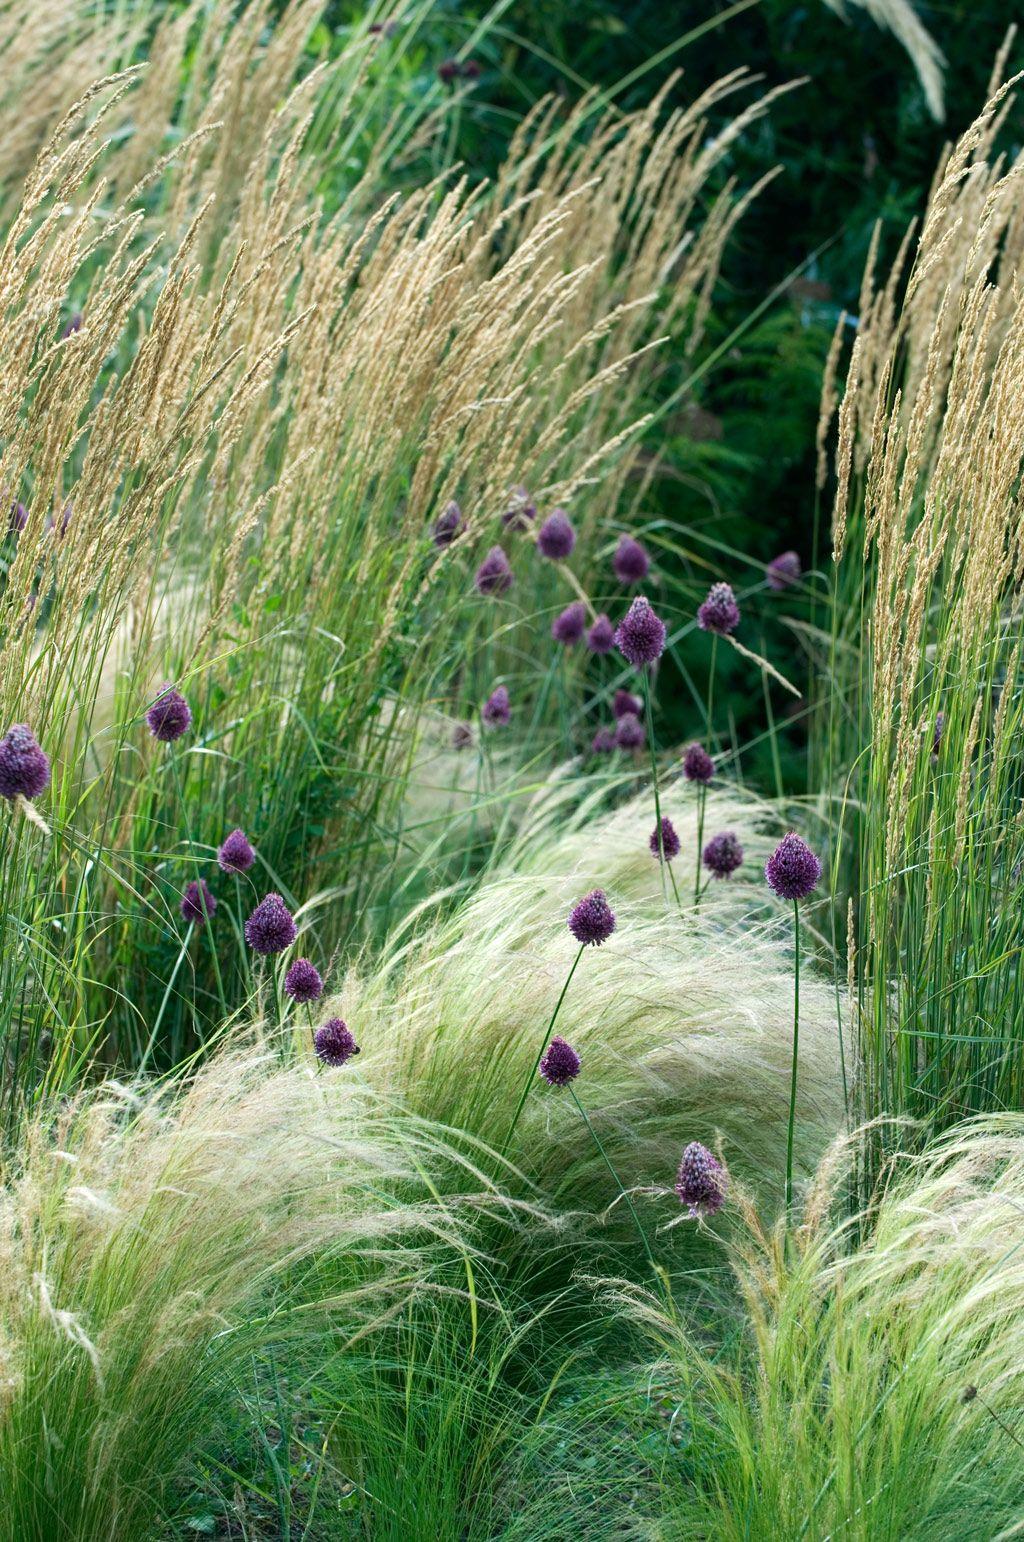 Allium Grass Lucy Redman School Of Garden Design 400 x 300